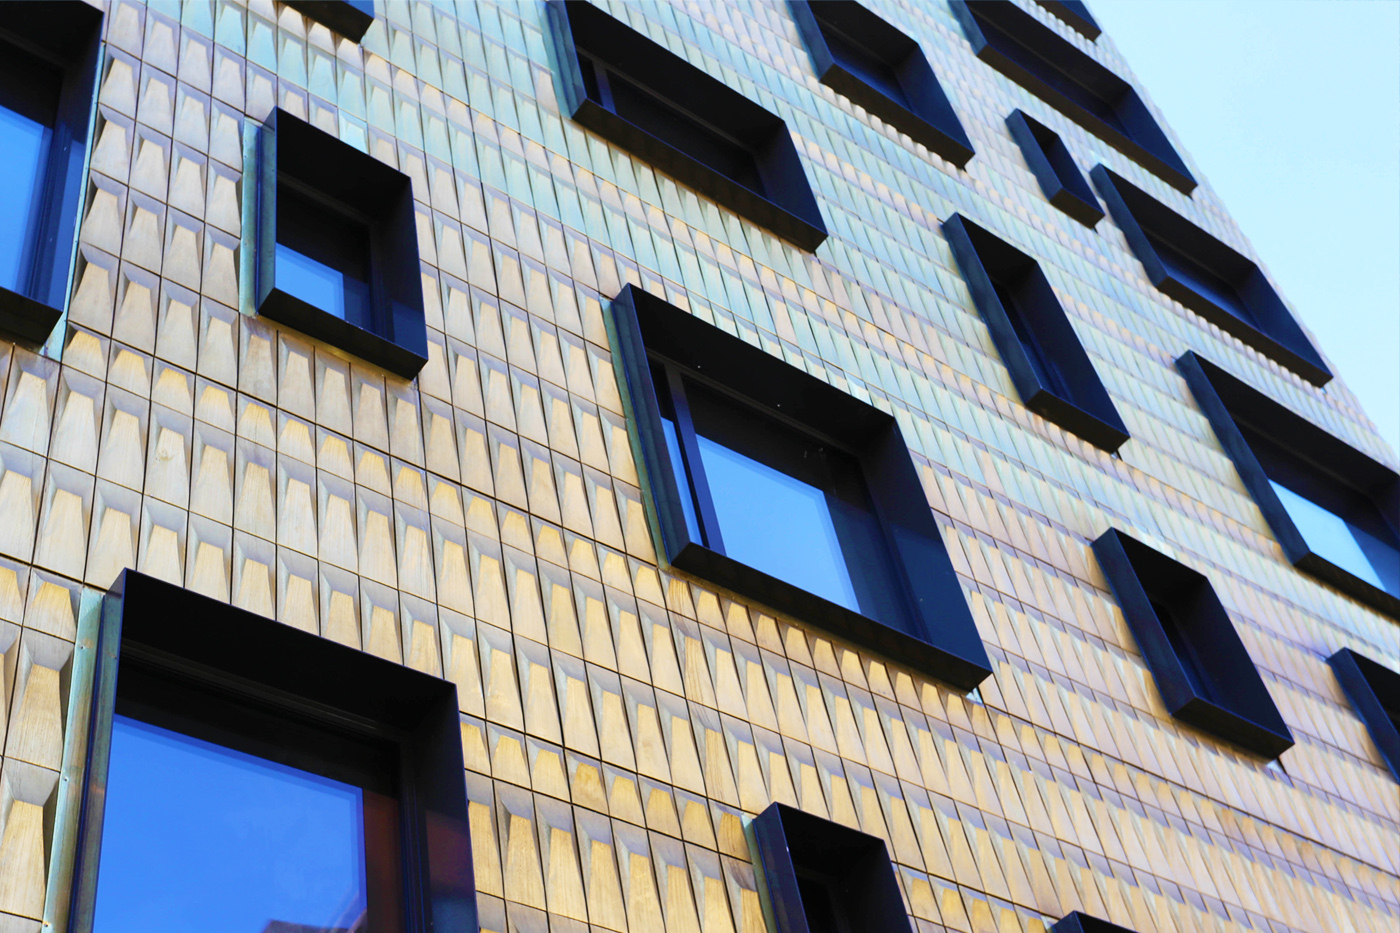 custom-pressed-brass-wall-cladding